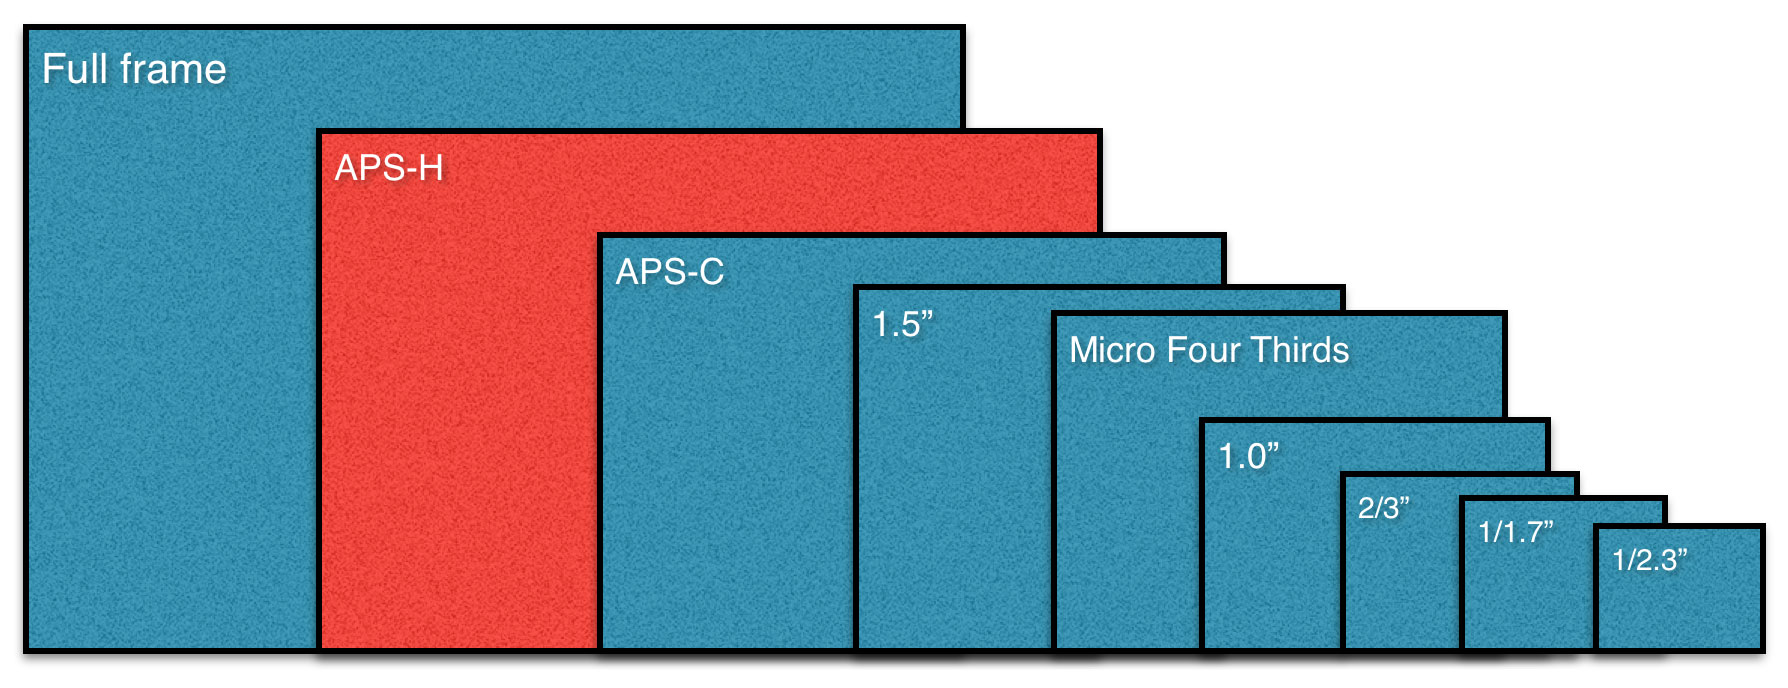 APS-H-sensor